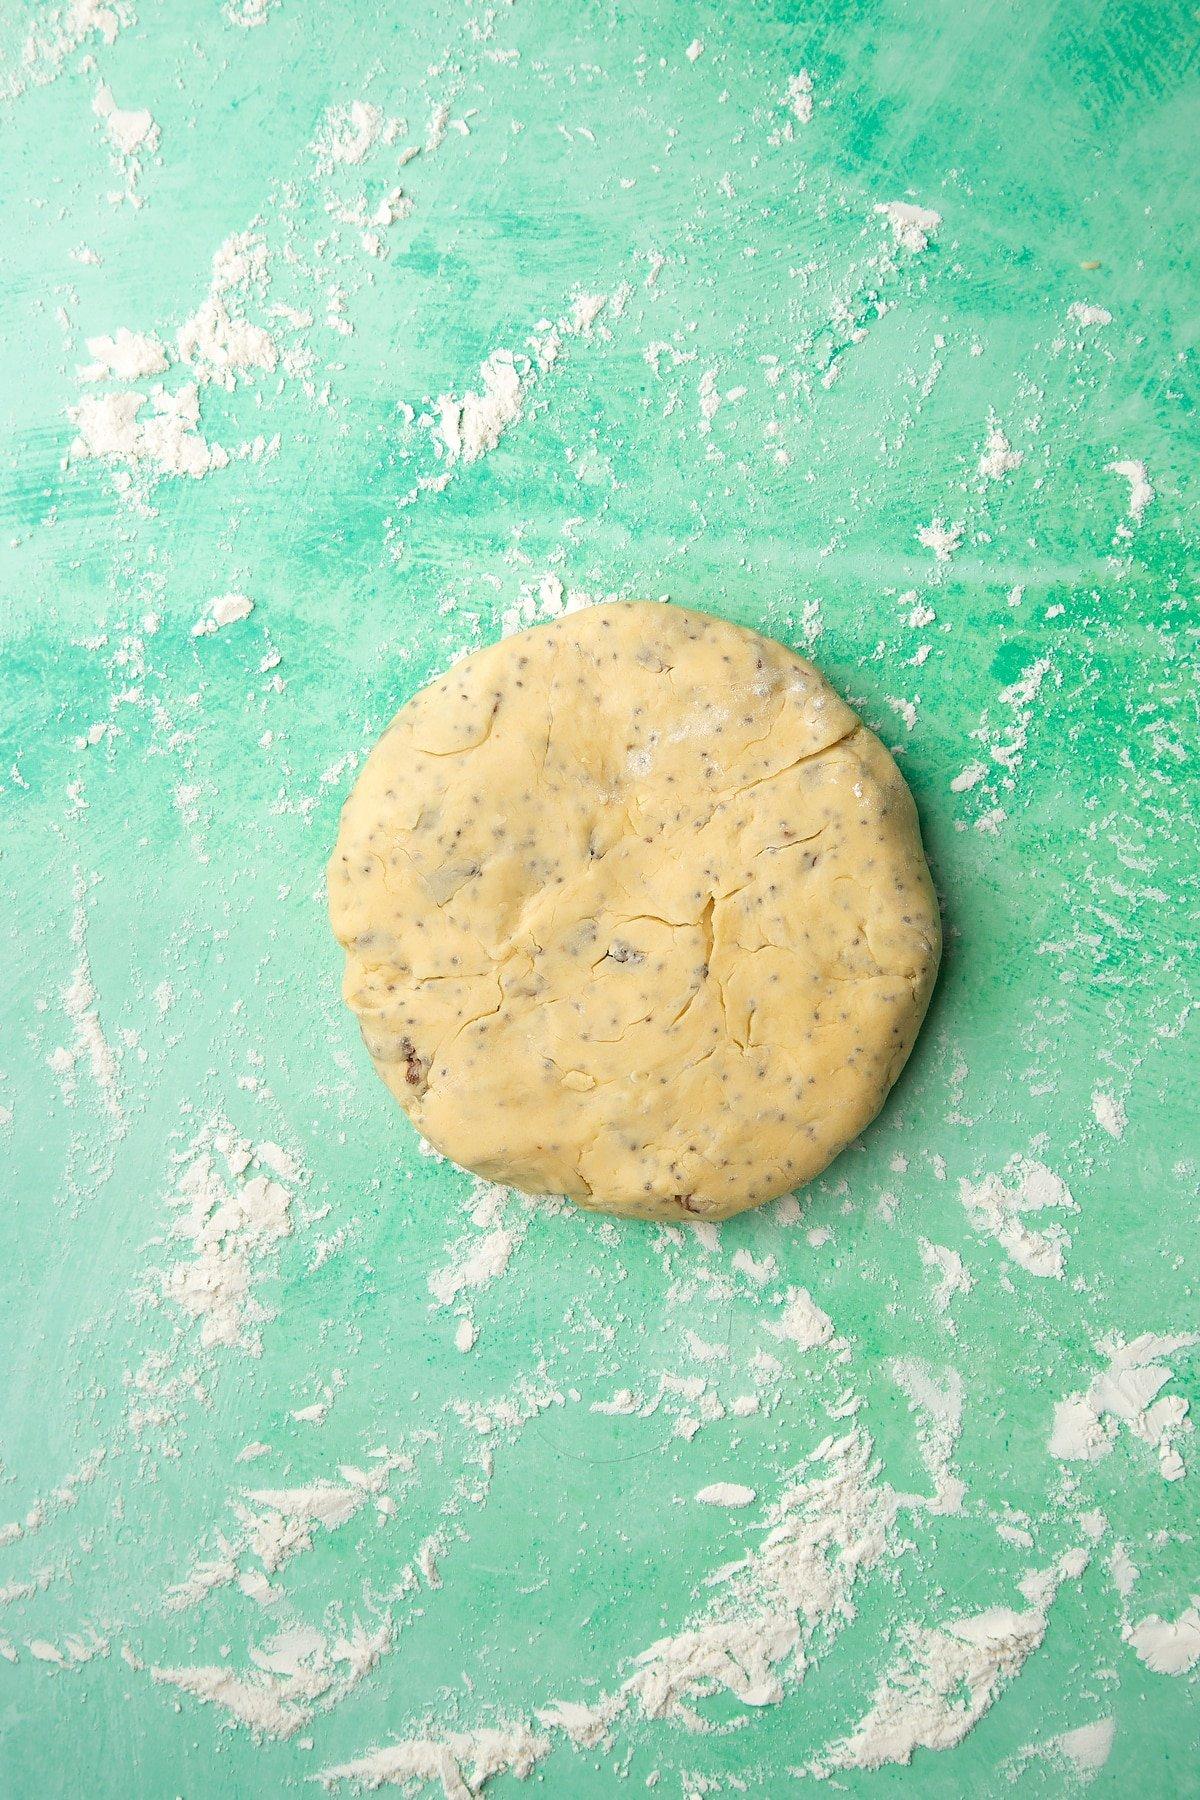 Vegan Welsh cakes dough on a floured surface.